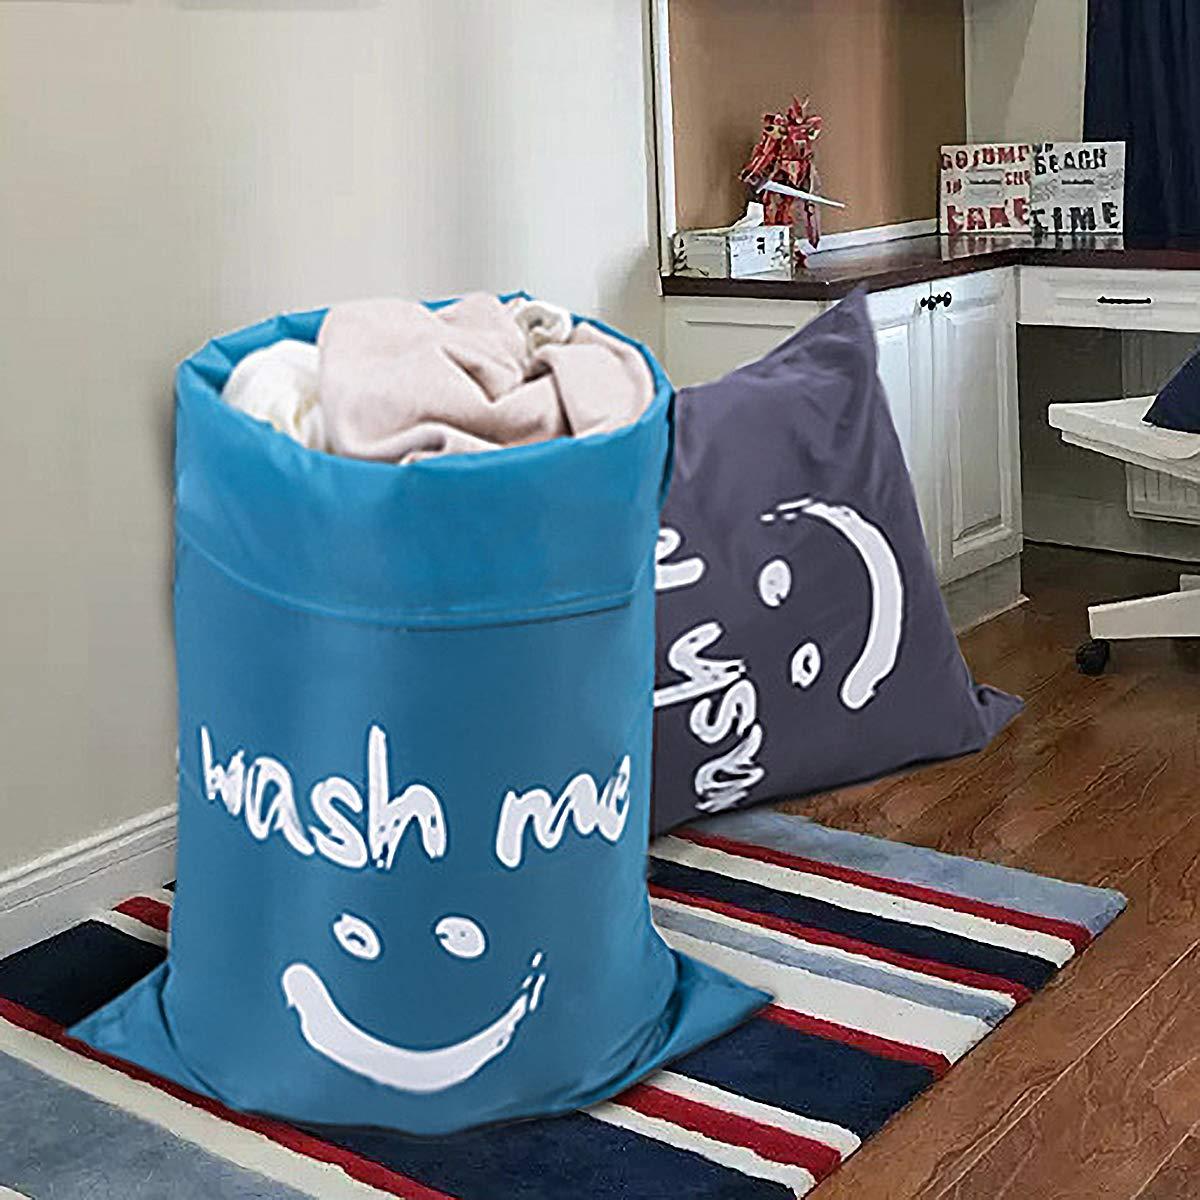 ZERO JET LAG 2 Pack Extra Large Travel Laundry Bag Set Nylon Rip-Stop Dirty Storage Bag Machine Washable Drawstring Closure 24'' x 36'' (Blue and Gray) by ZERO JET LAG (Image #10)